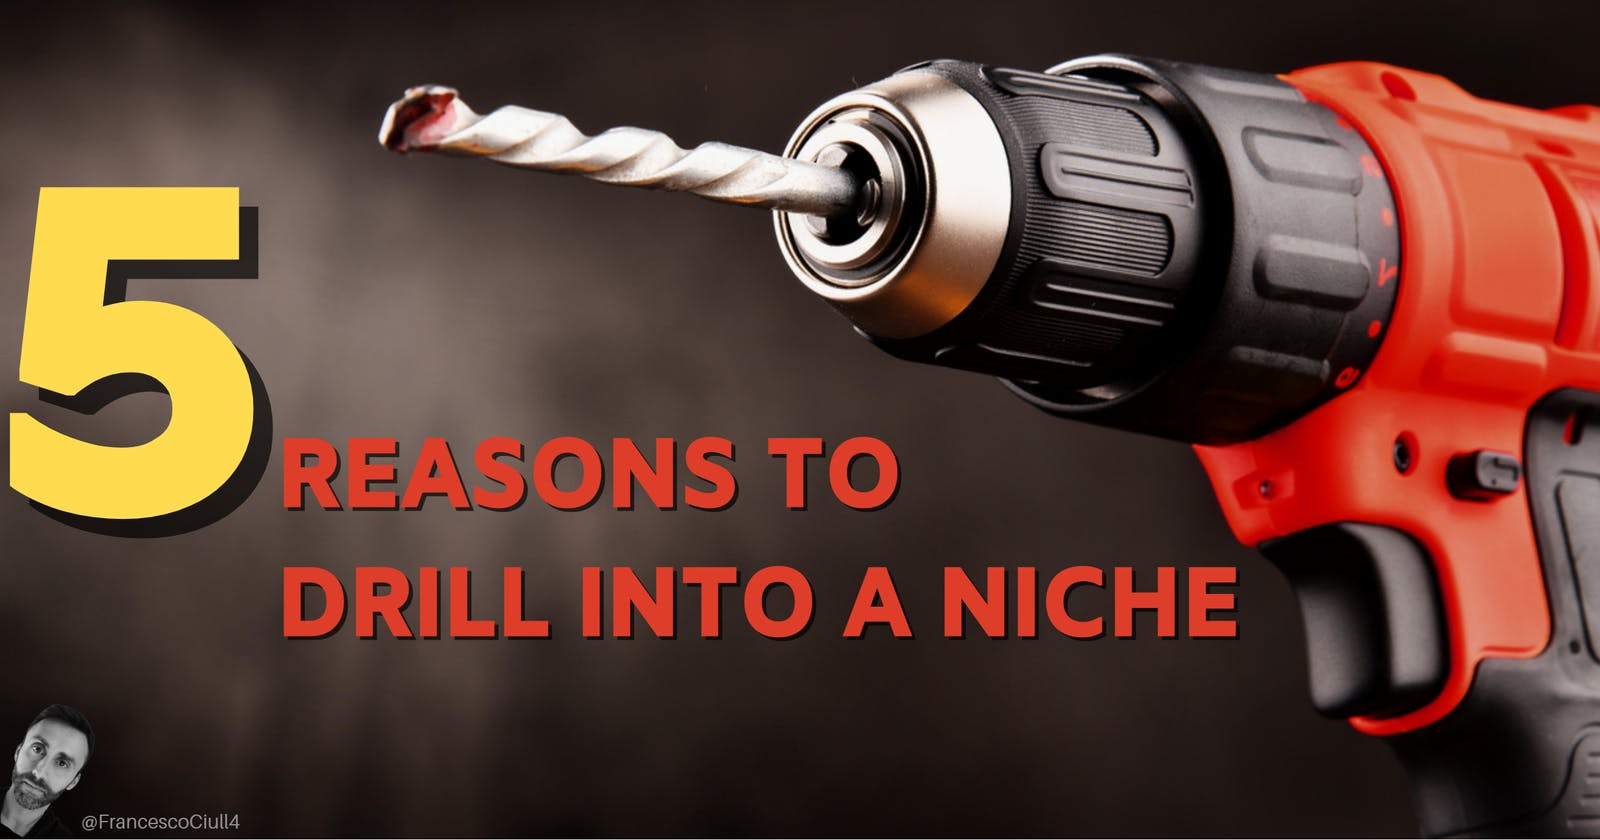 5 Reasons to drill into a Niche